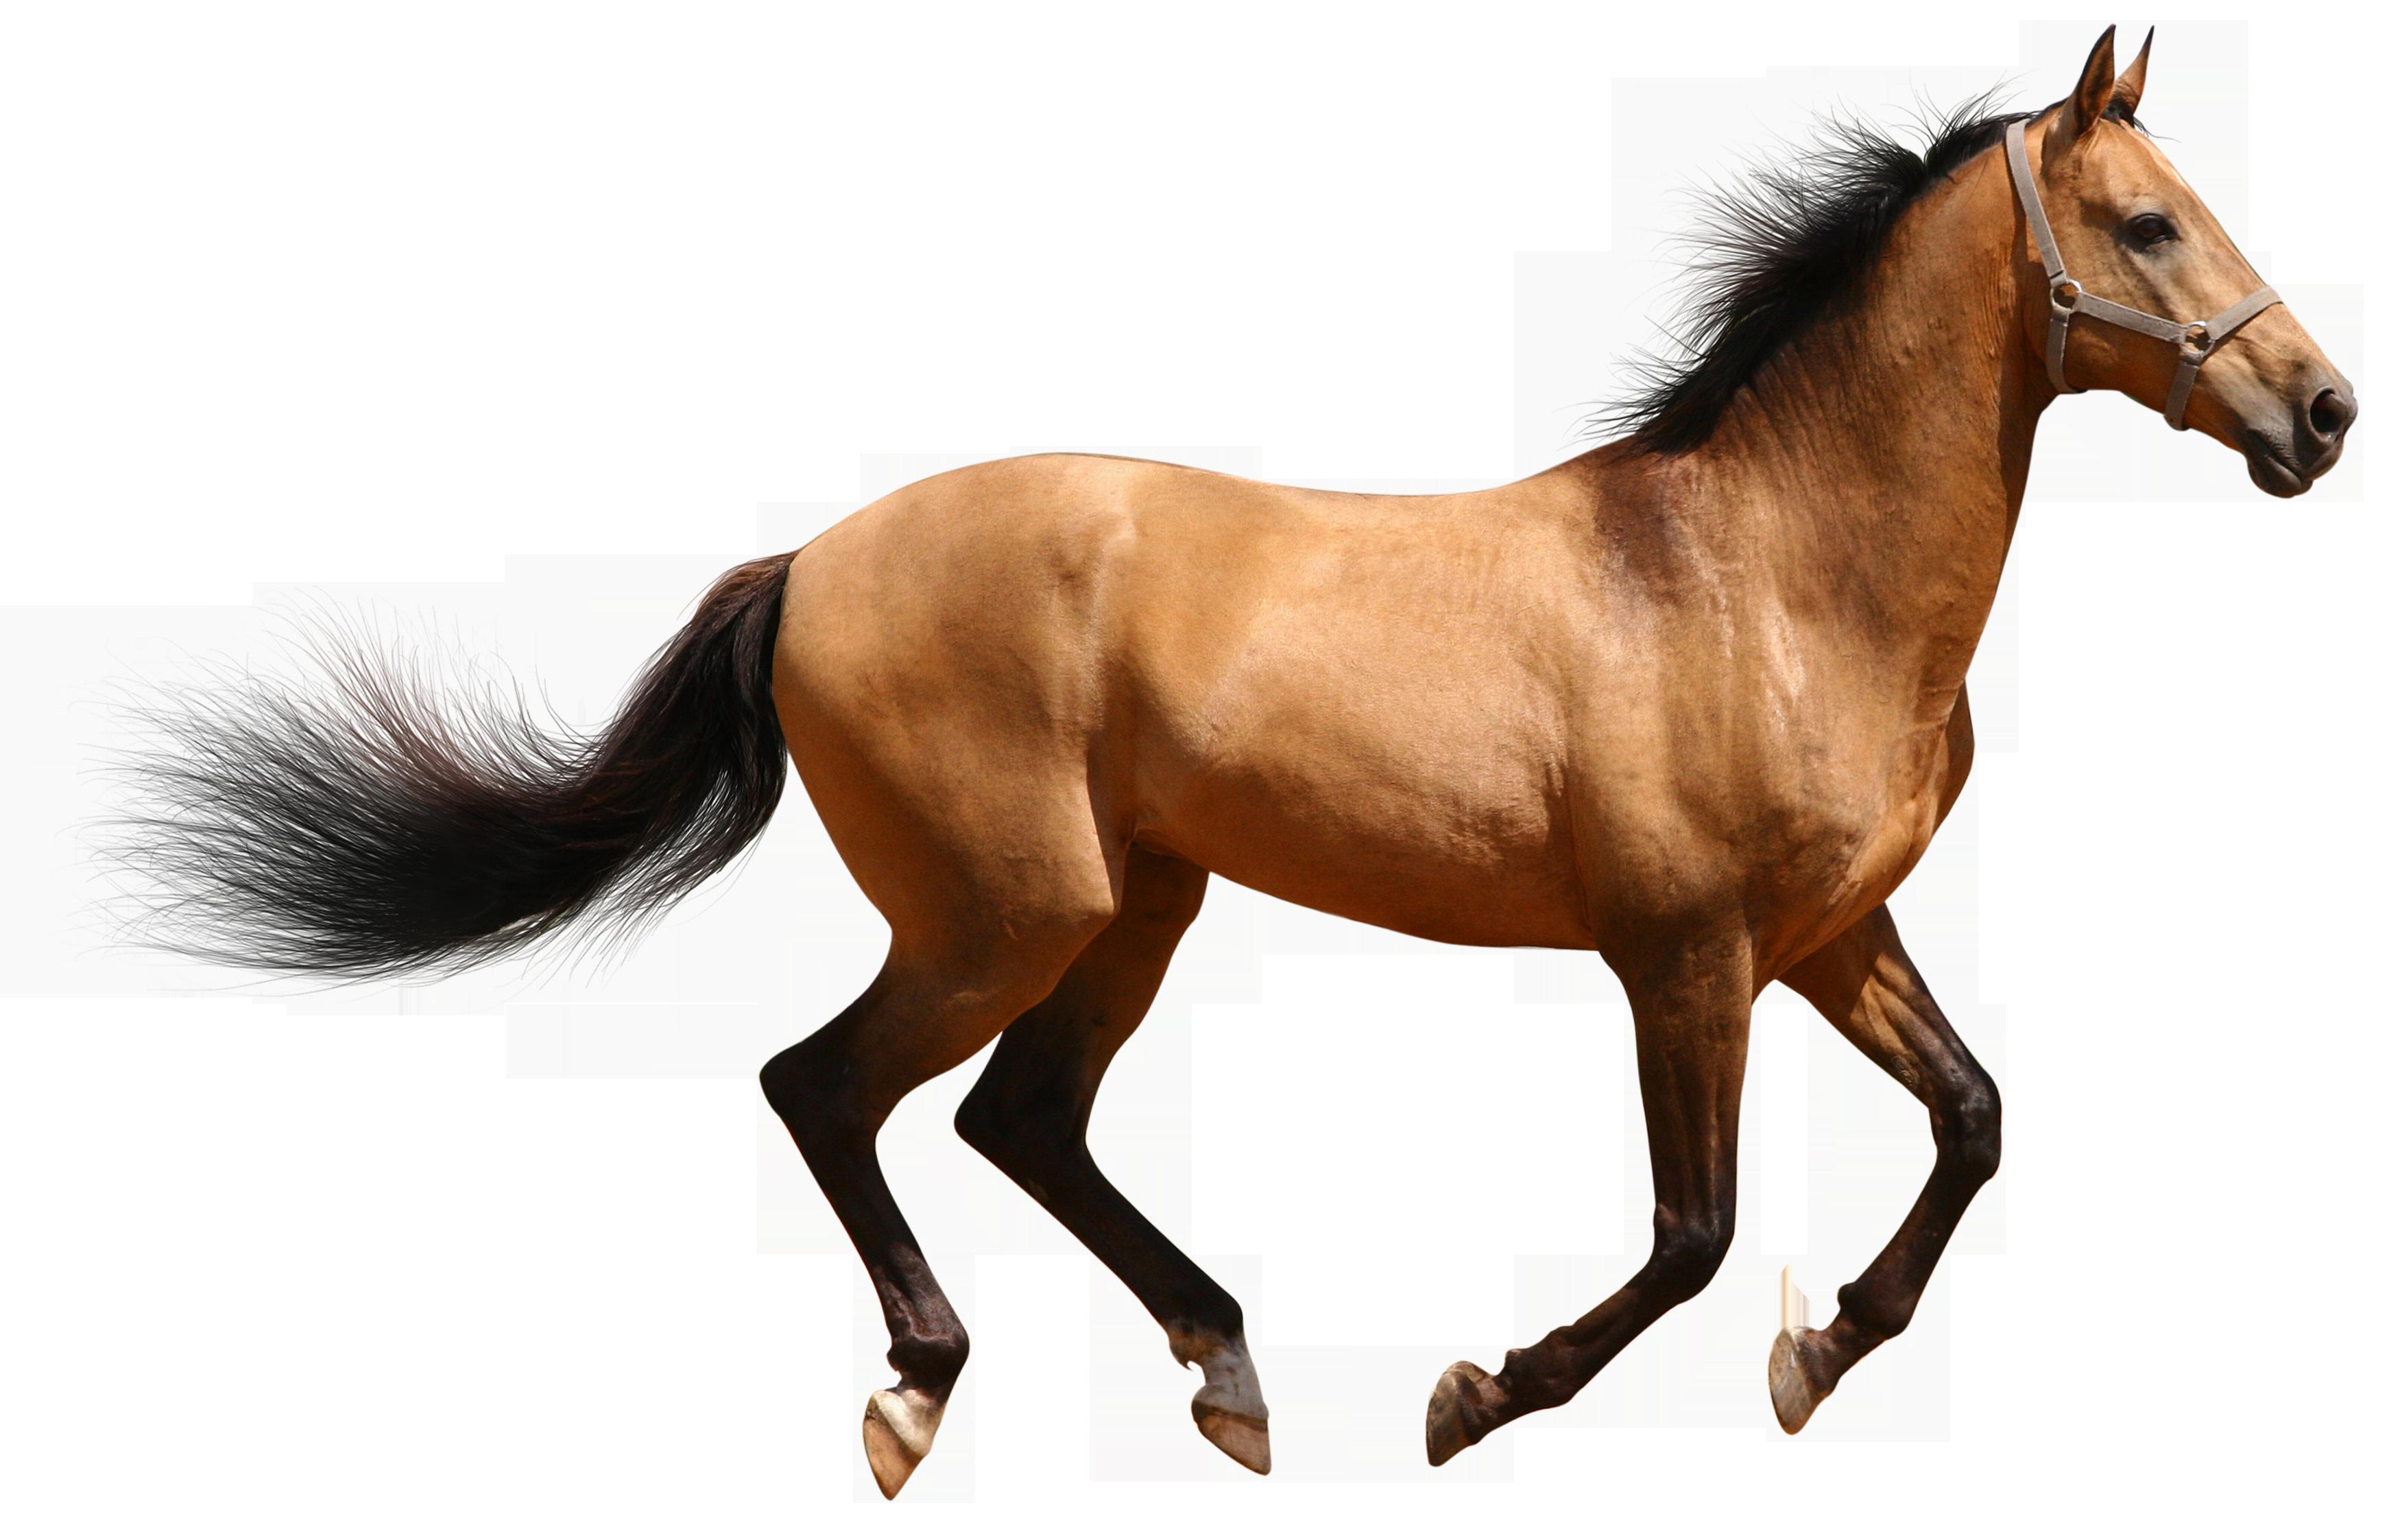 Hq png transparent images. Horse clipart front